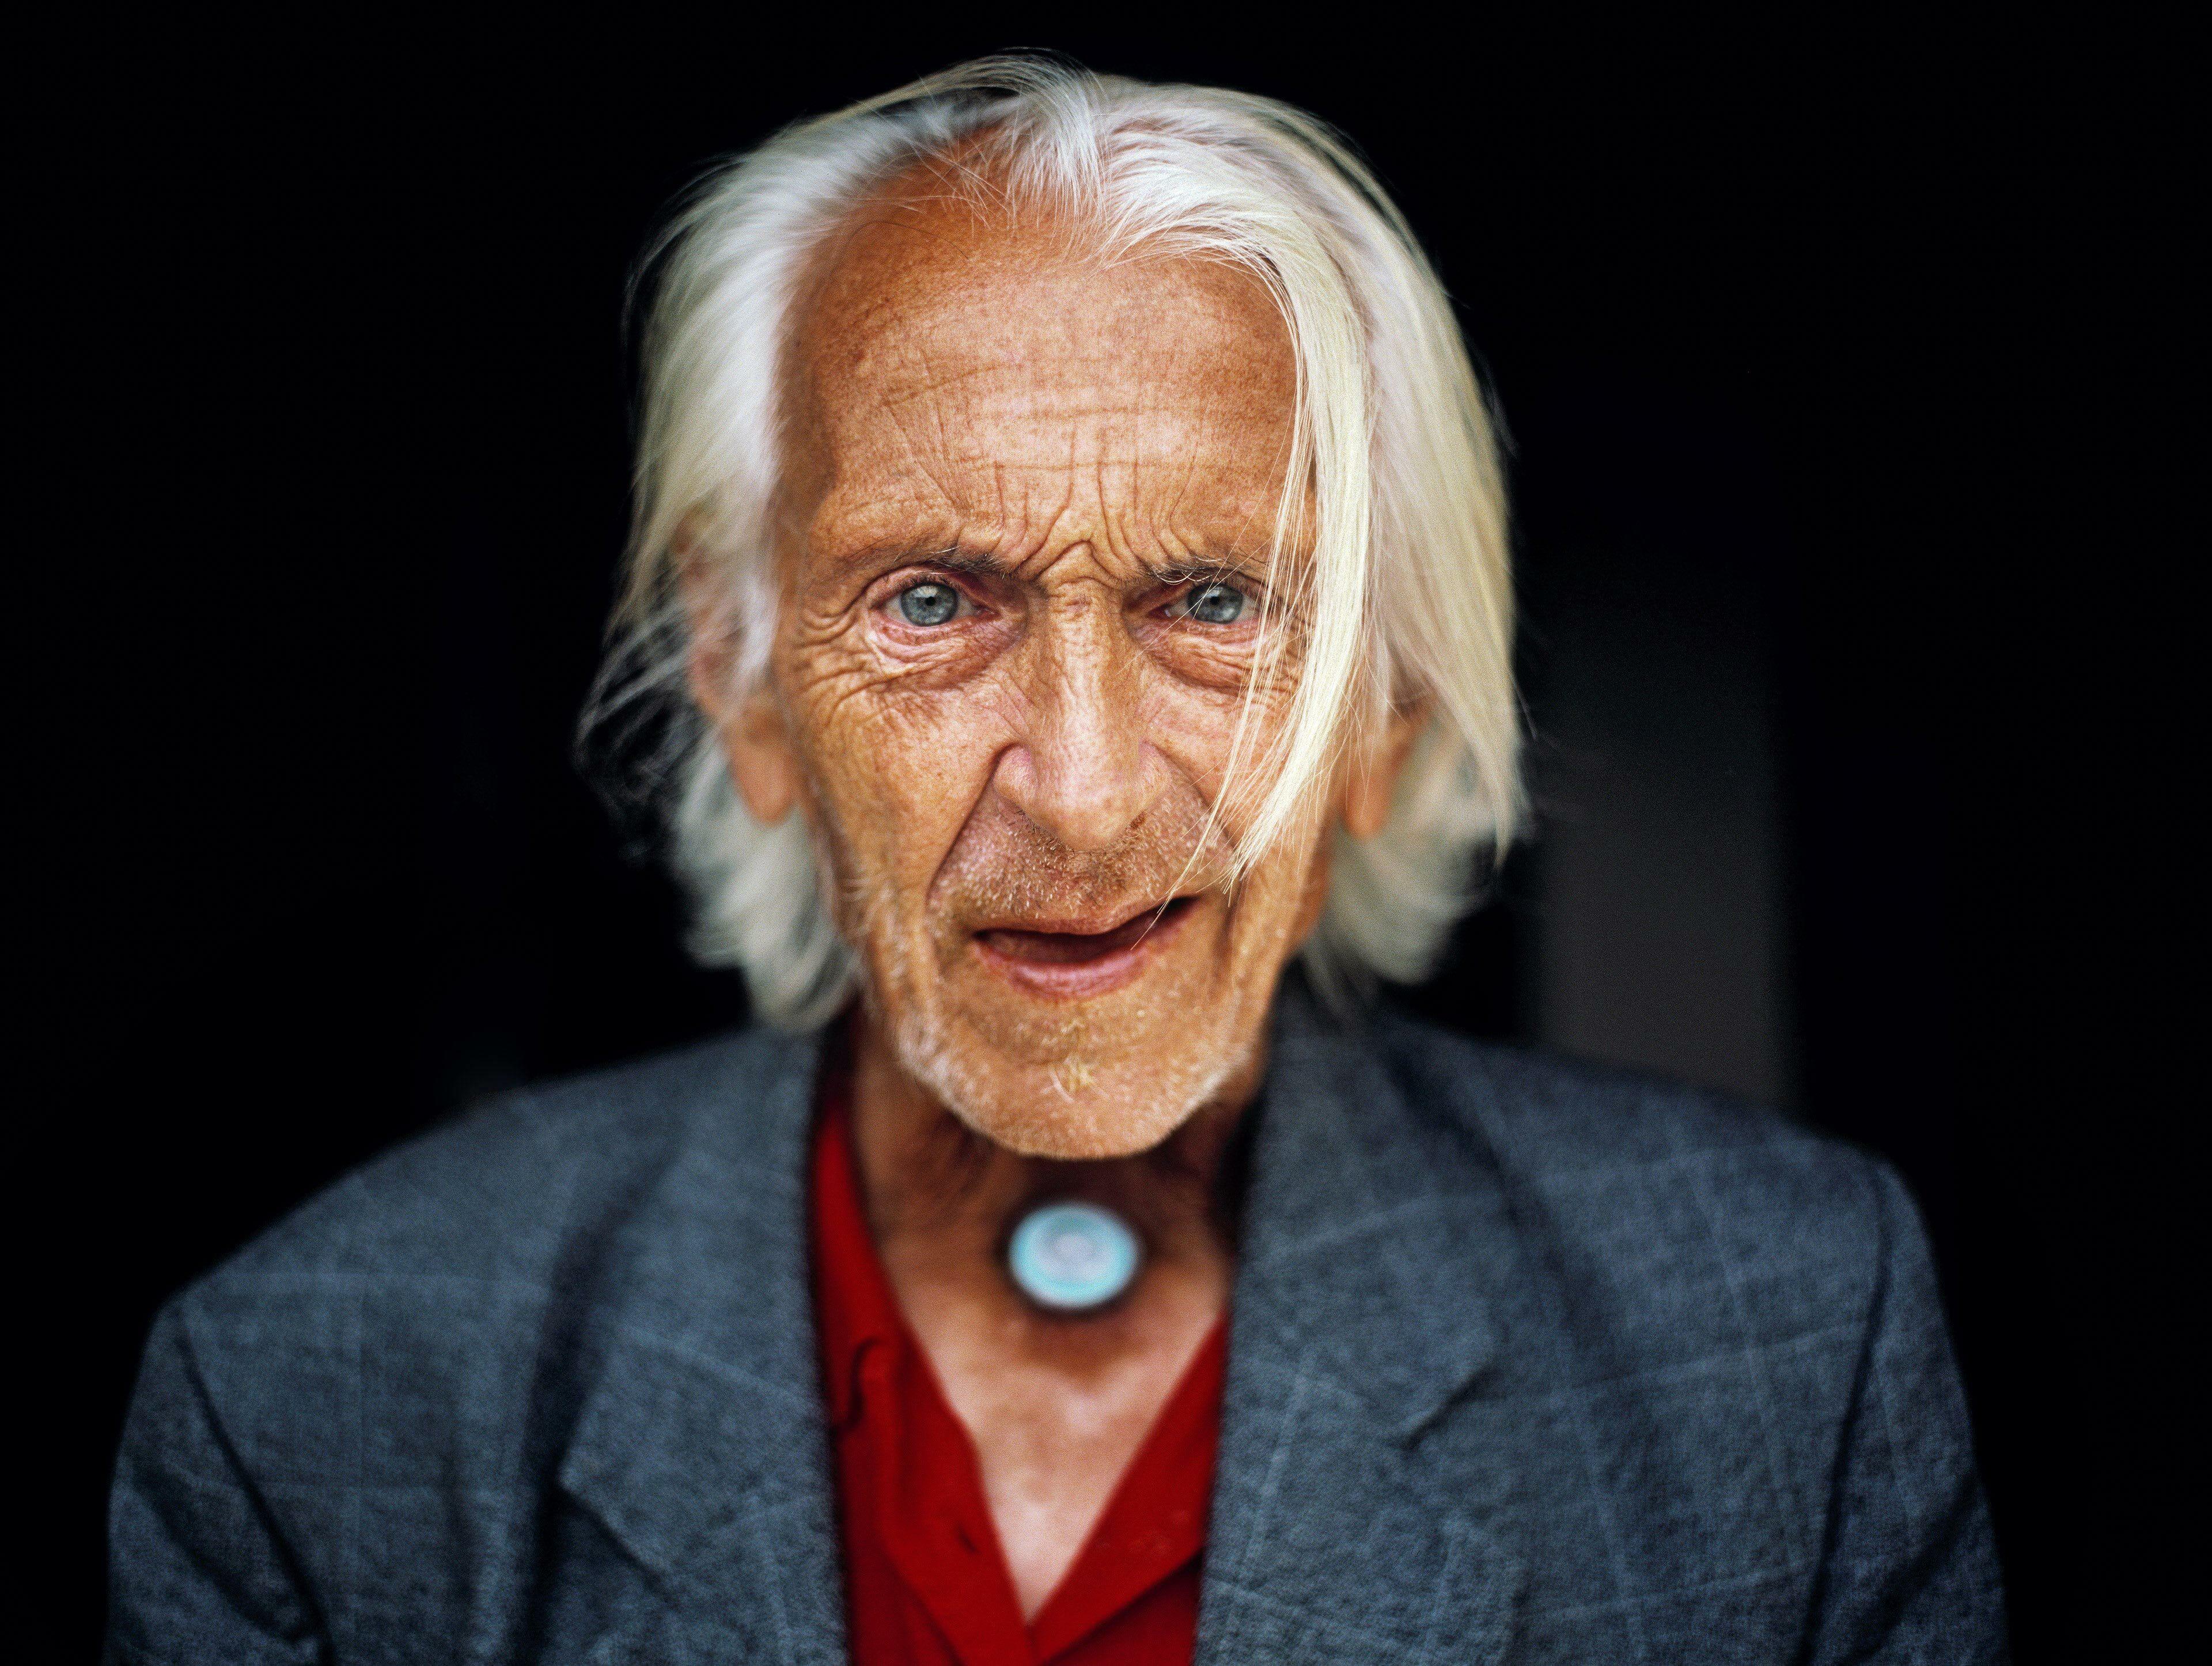 Richard Moran Portraits People Lifestyle 023